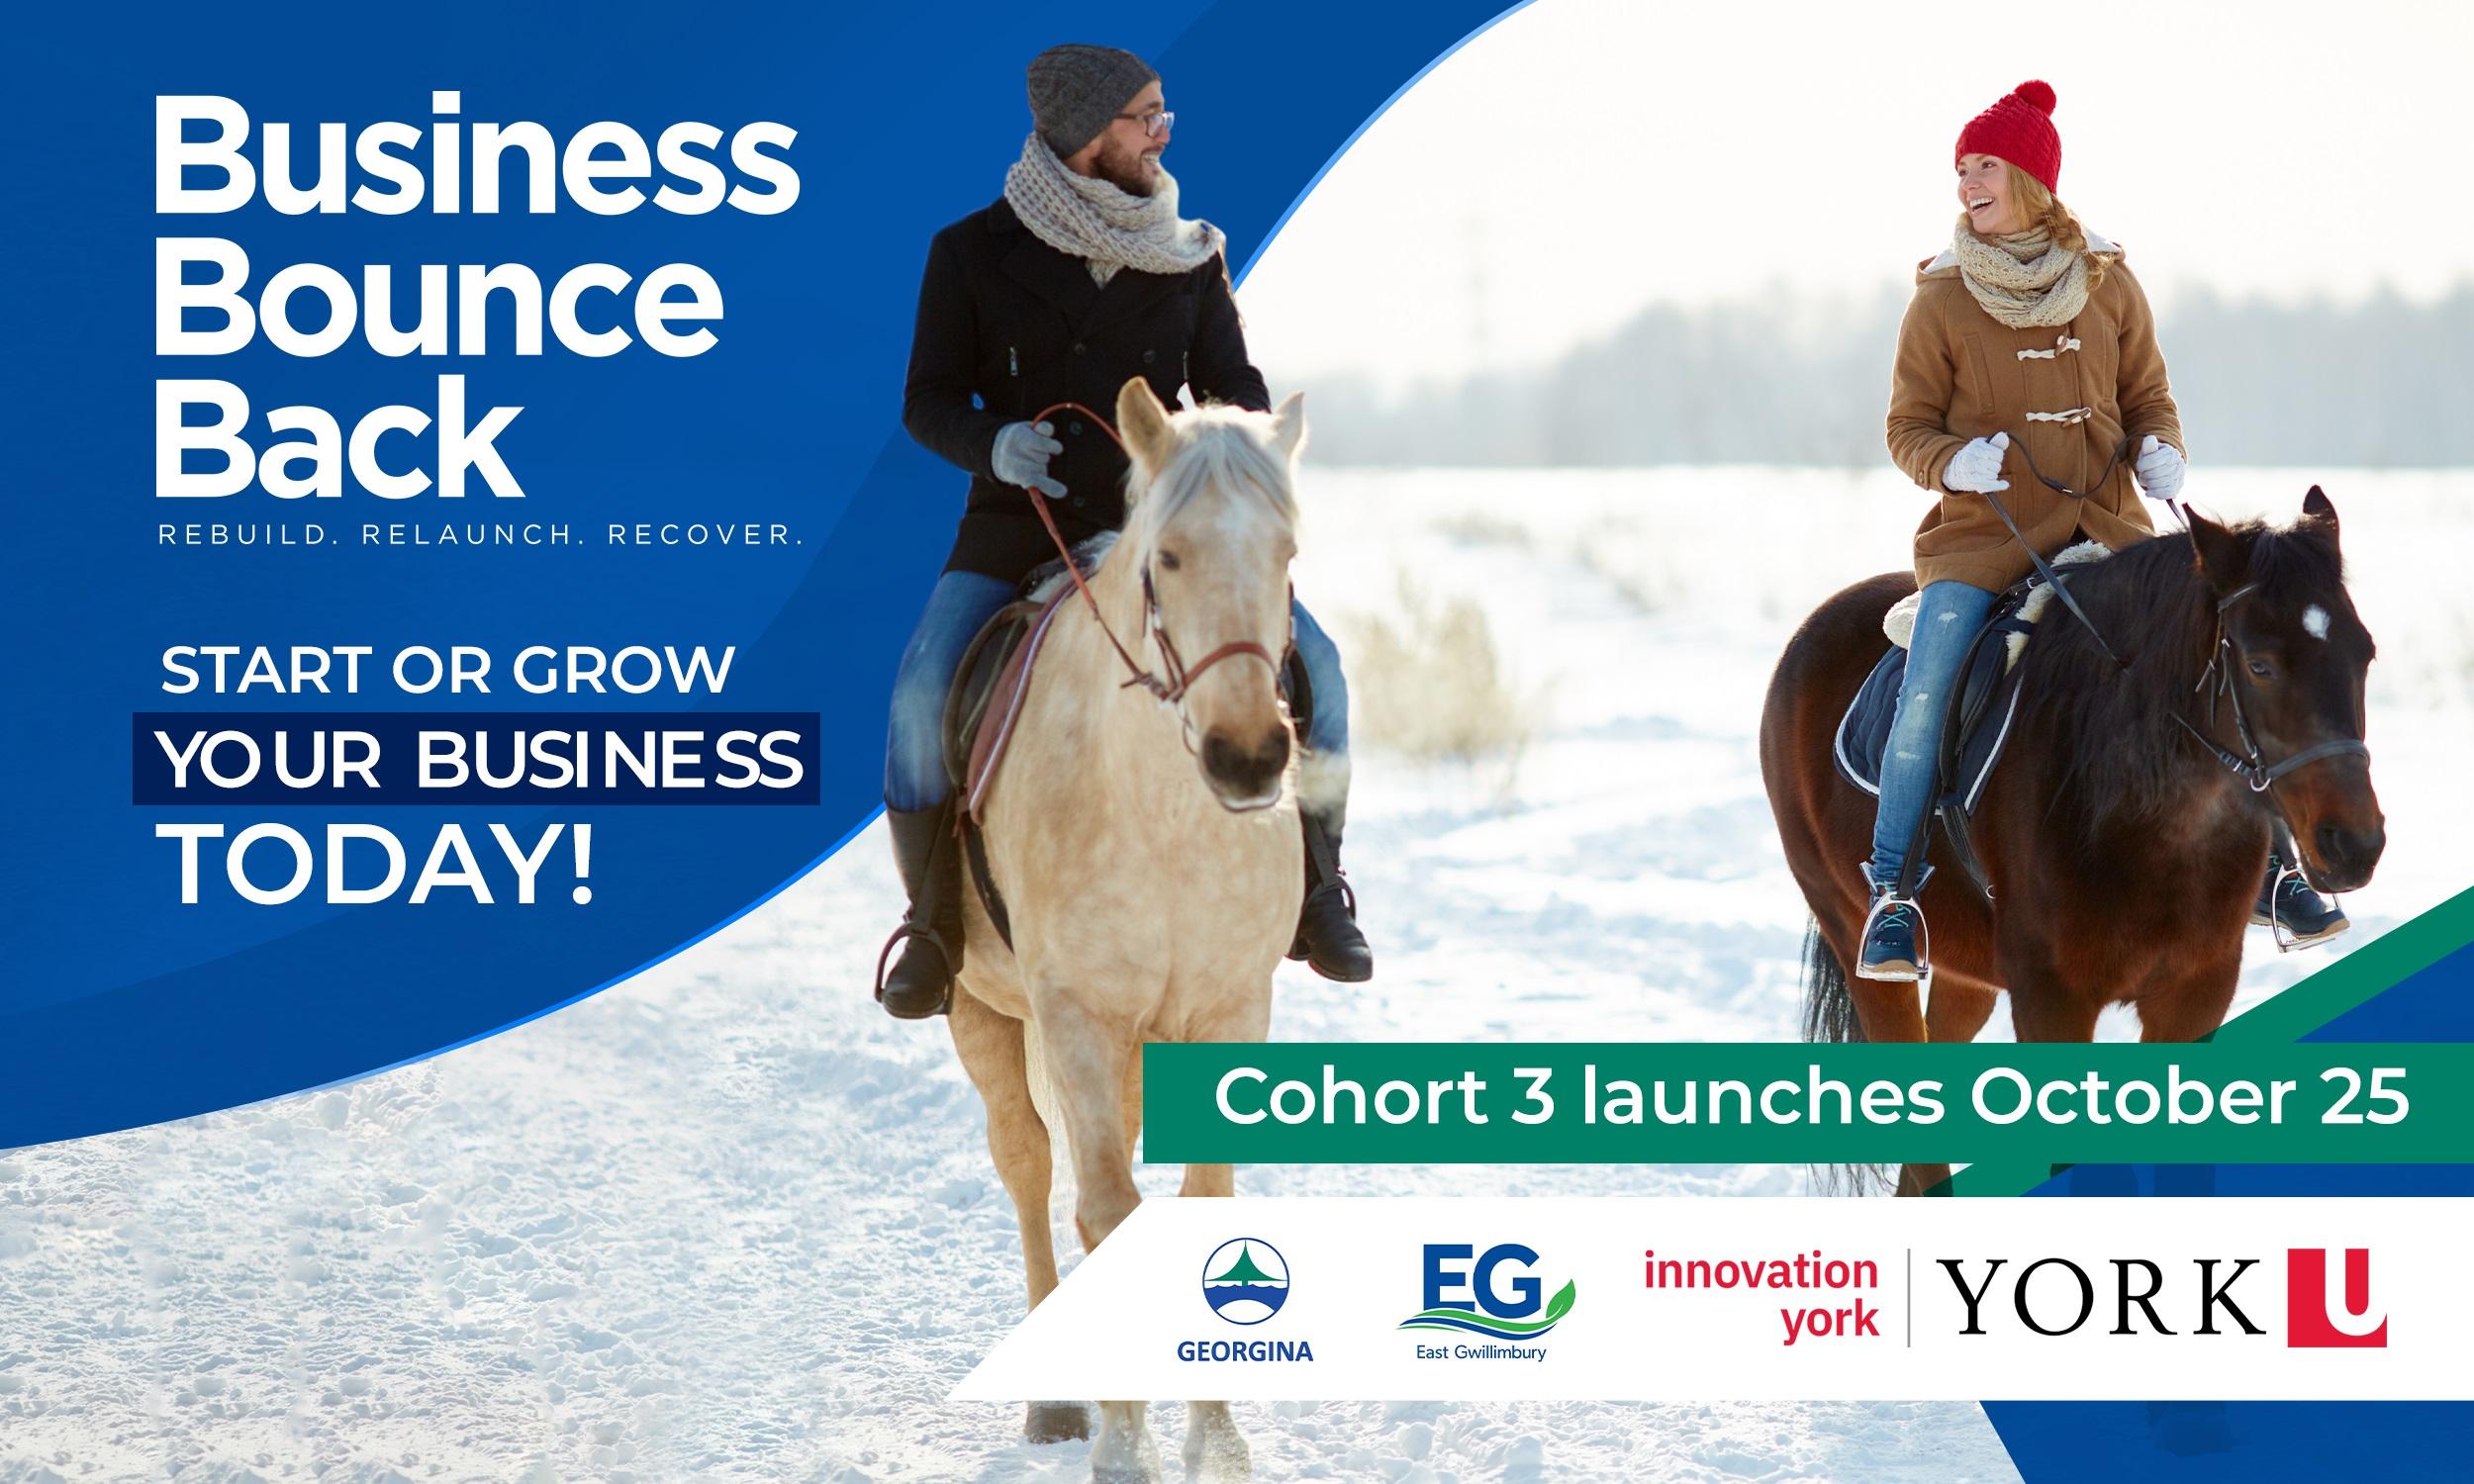 Business Bounce Back cohort 3